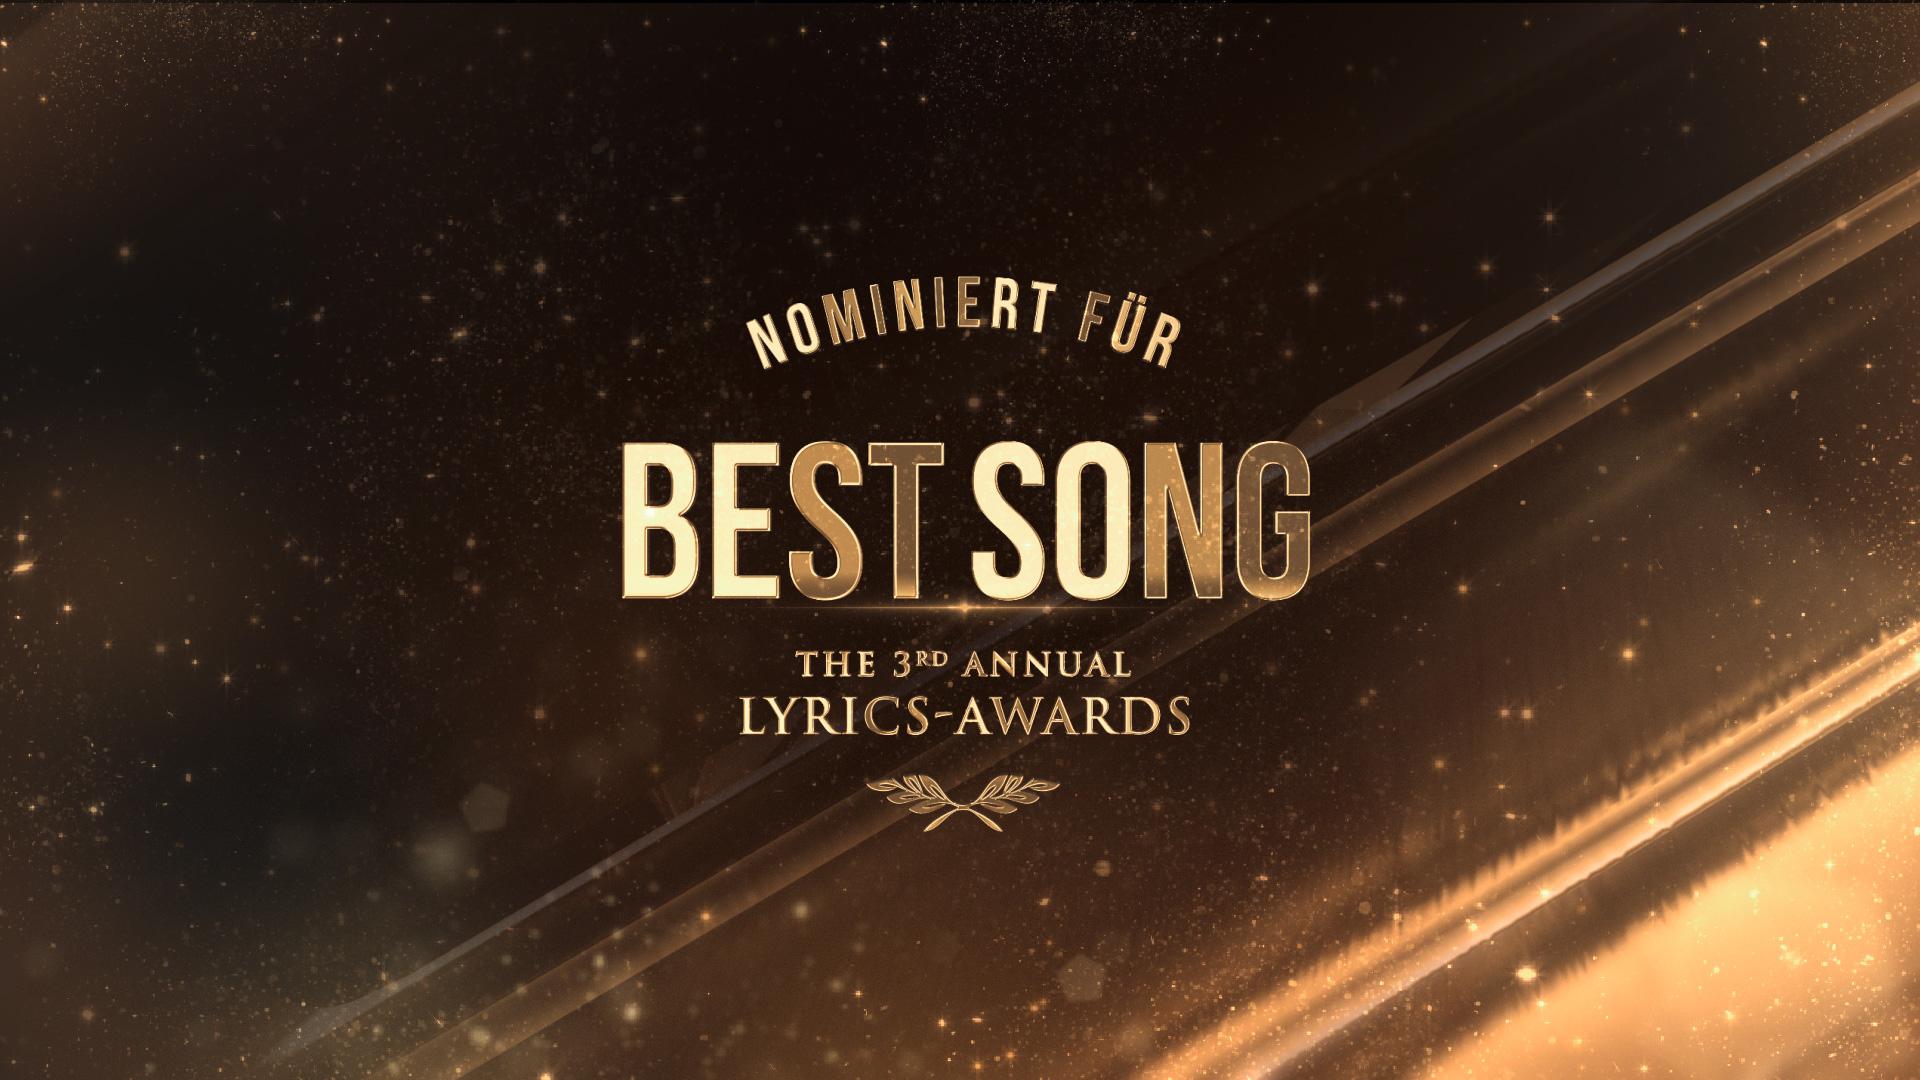 Best Song | LYRICS-Awards 2018